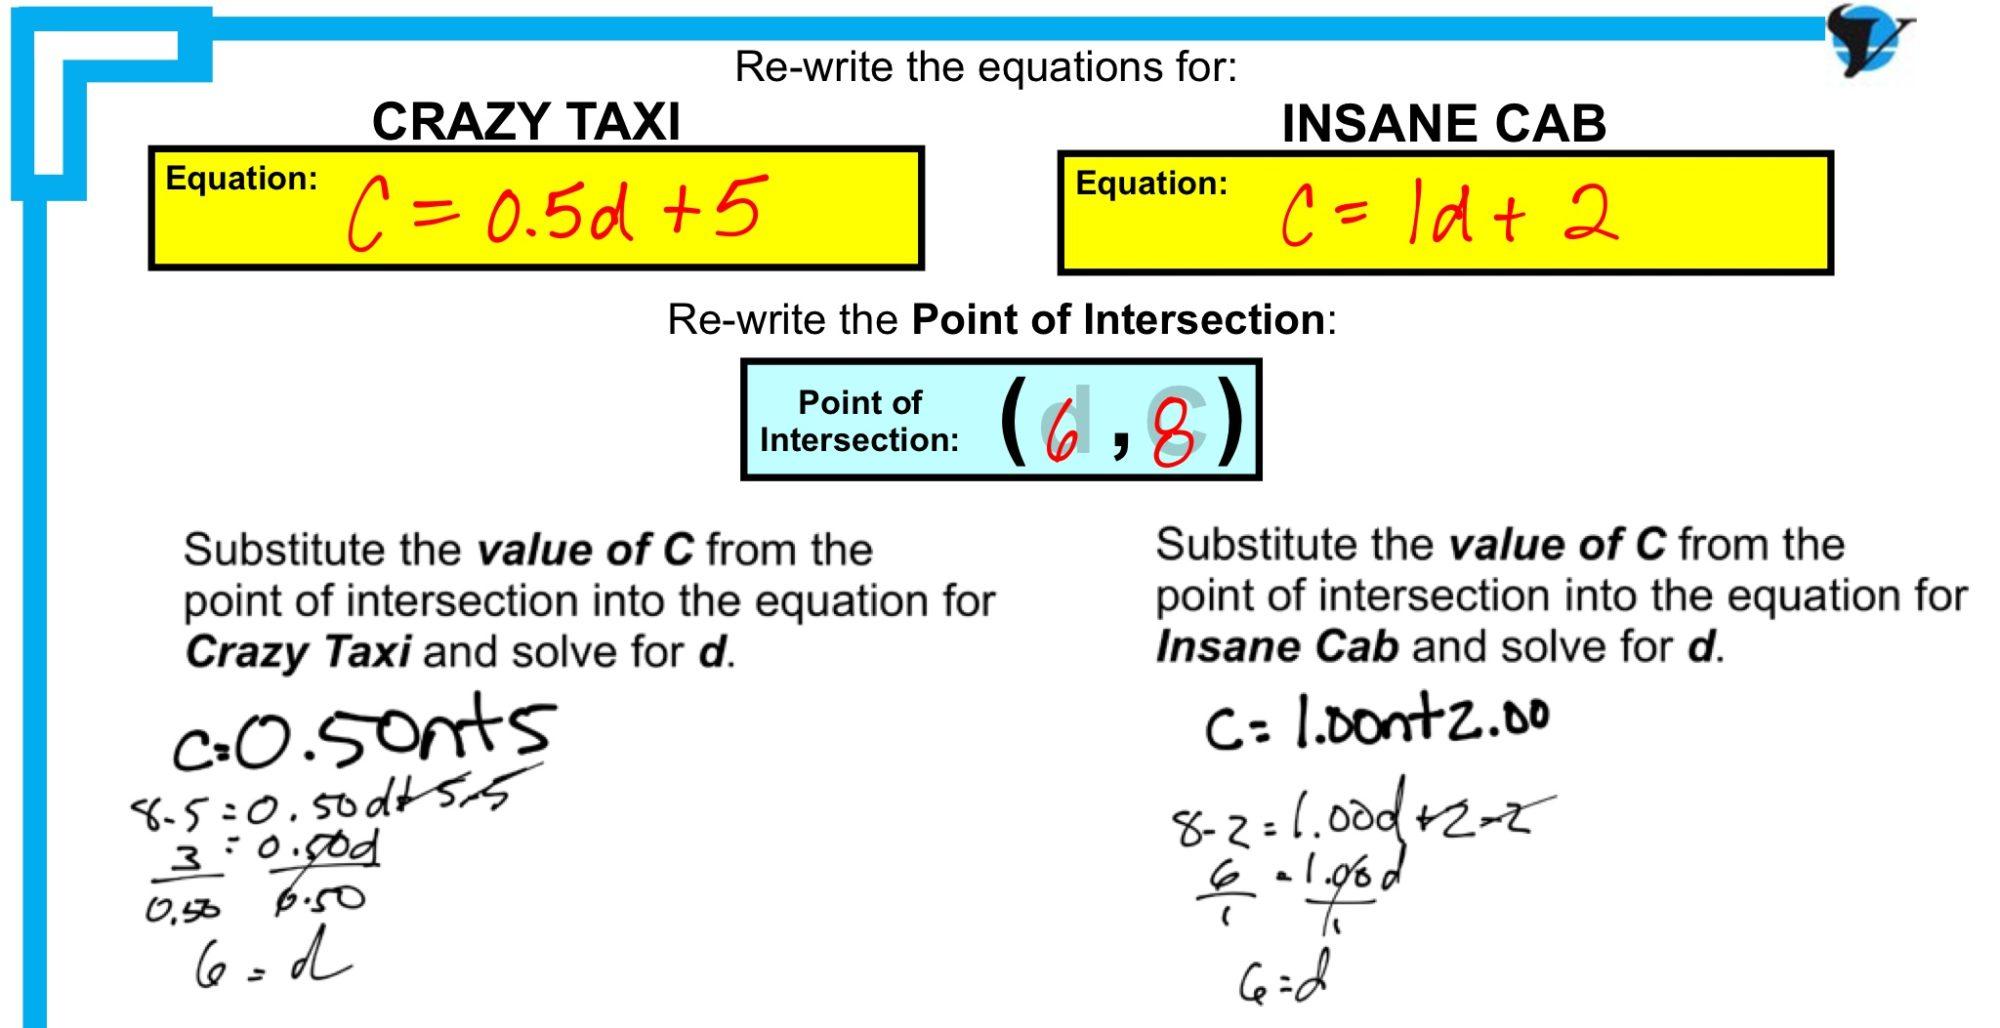 Crazy Taxi vs Insane Cab - Solving Linear Equations Individually